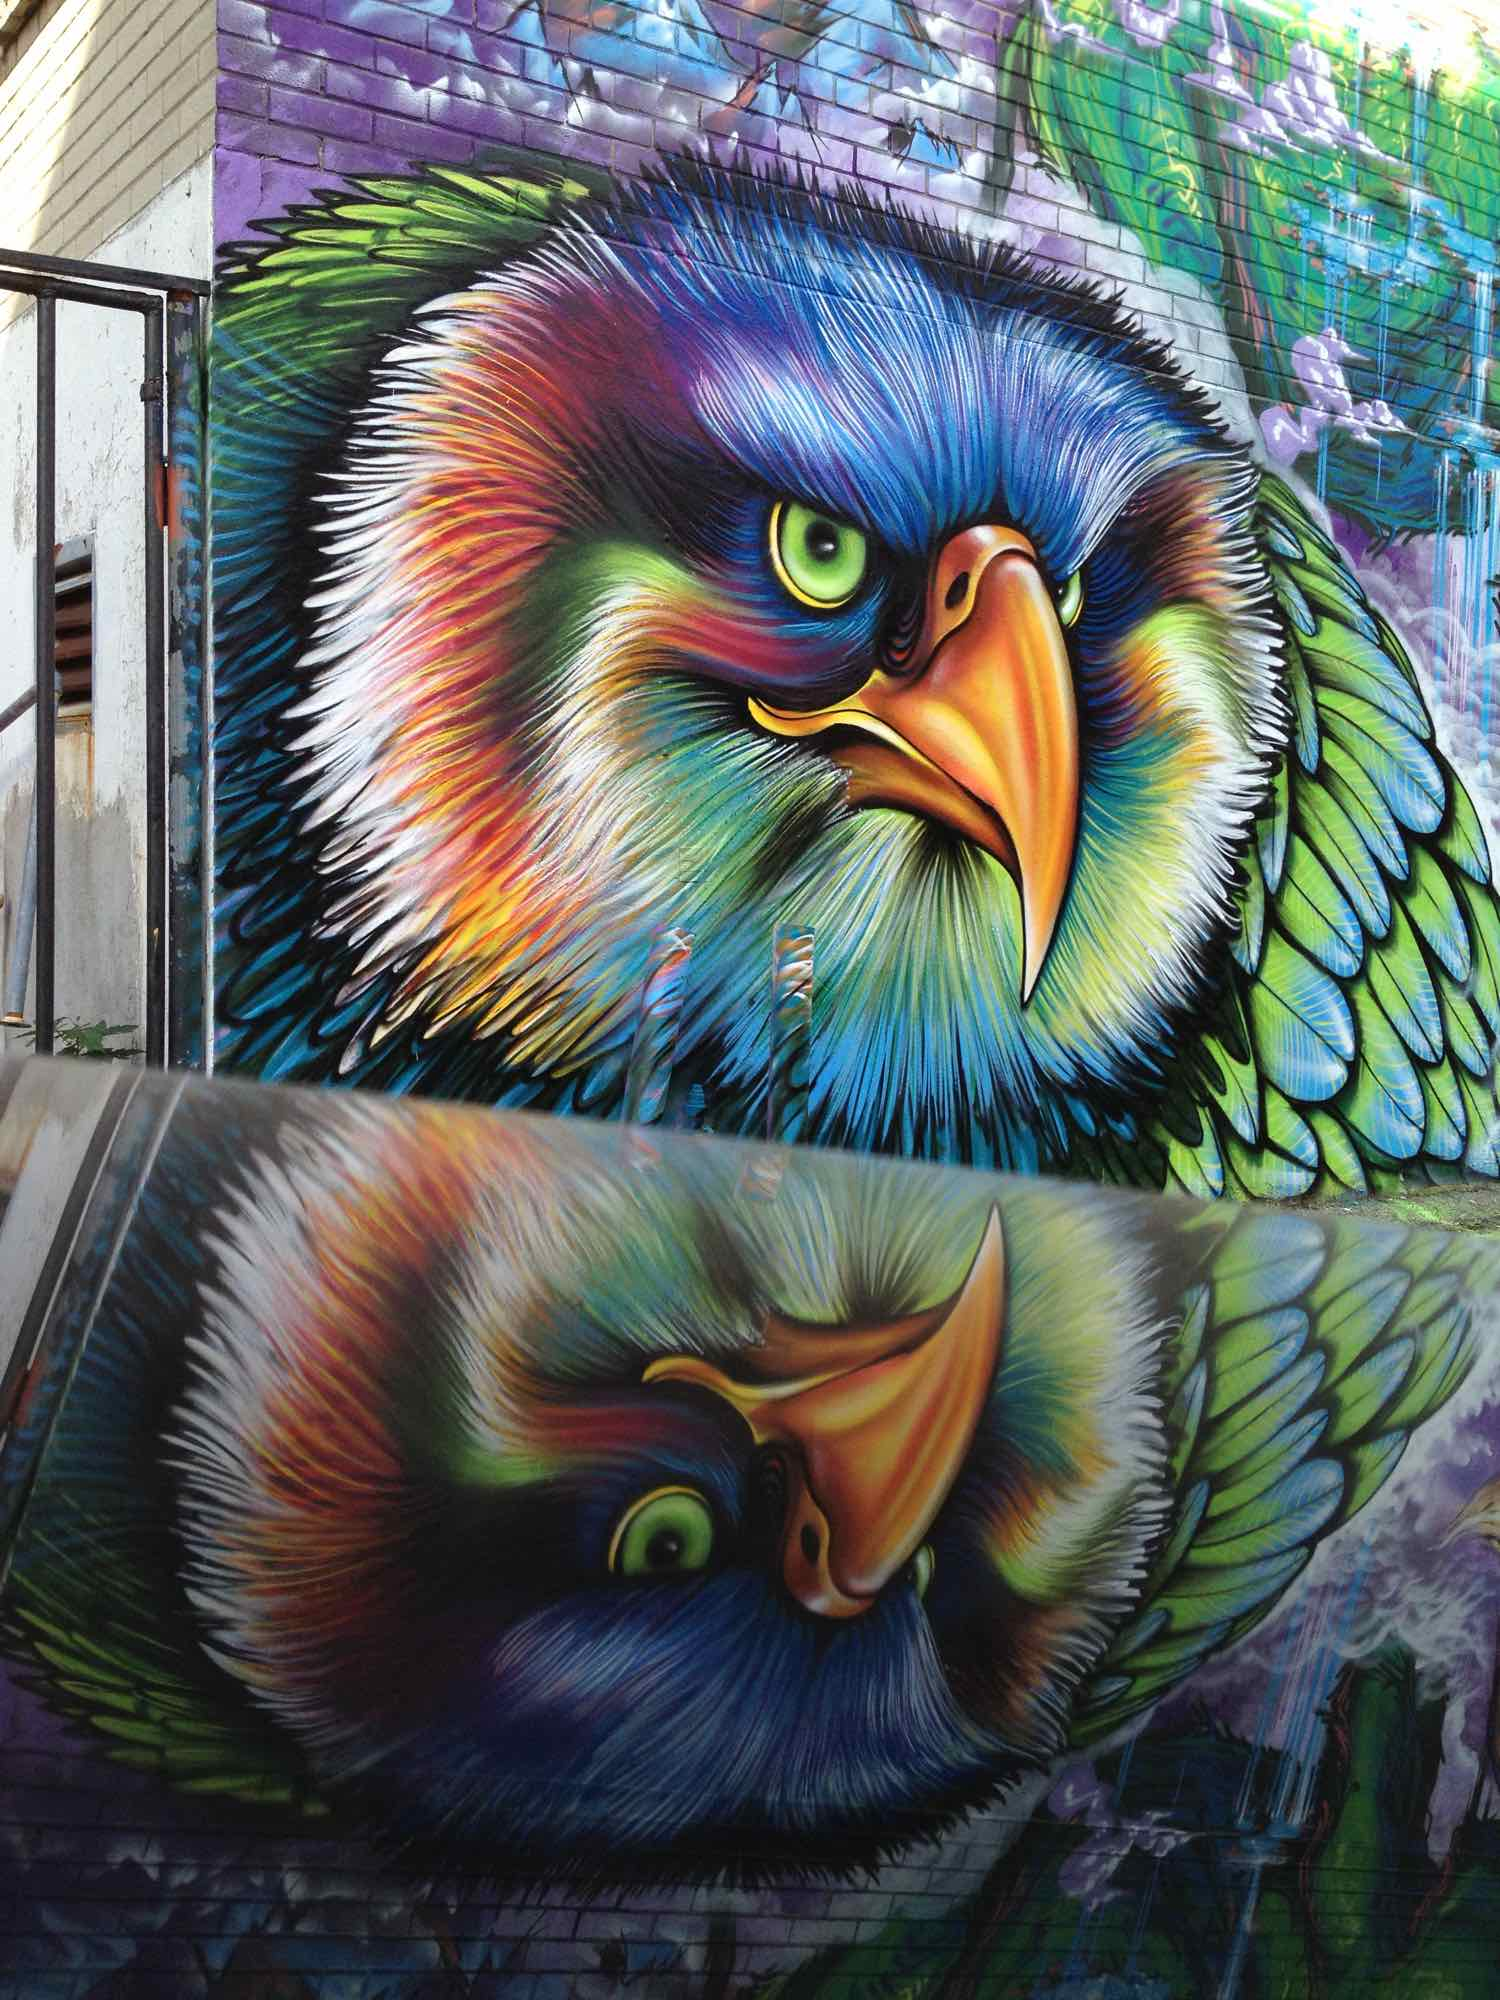 The_Walls_Of_Montreal-Ezra_Soiferman - 19.jpg